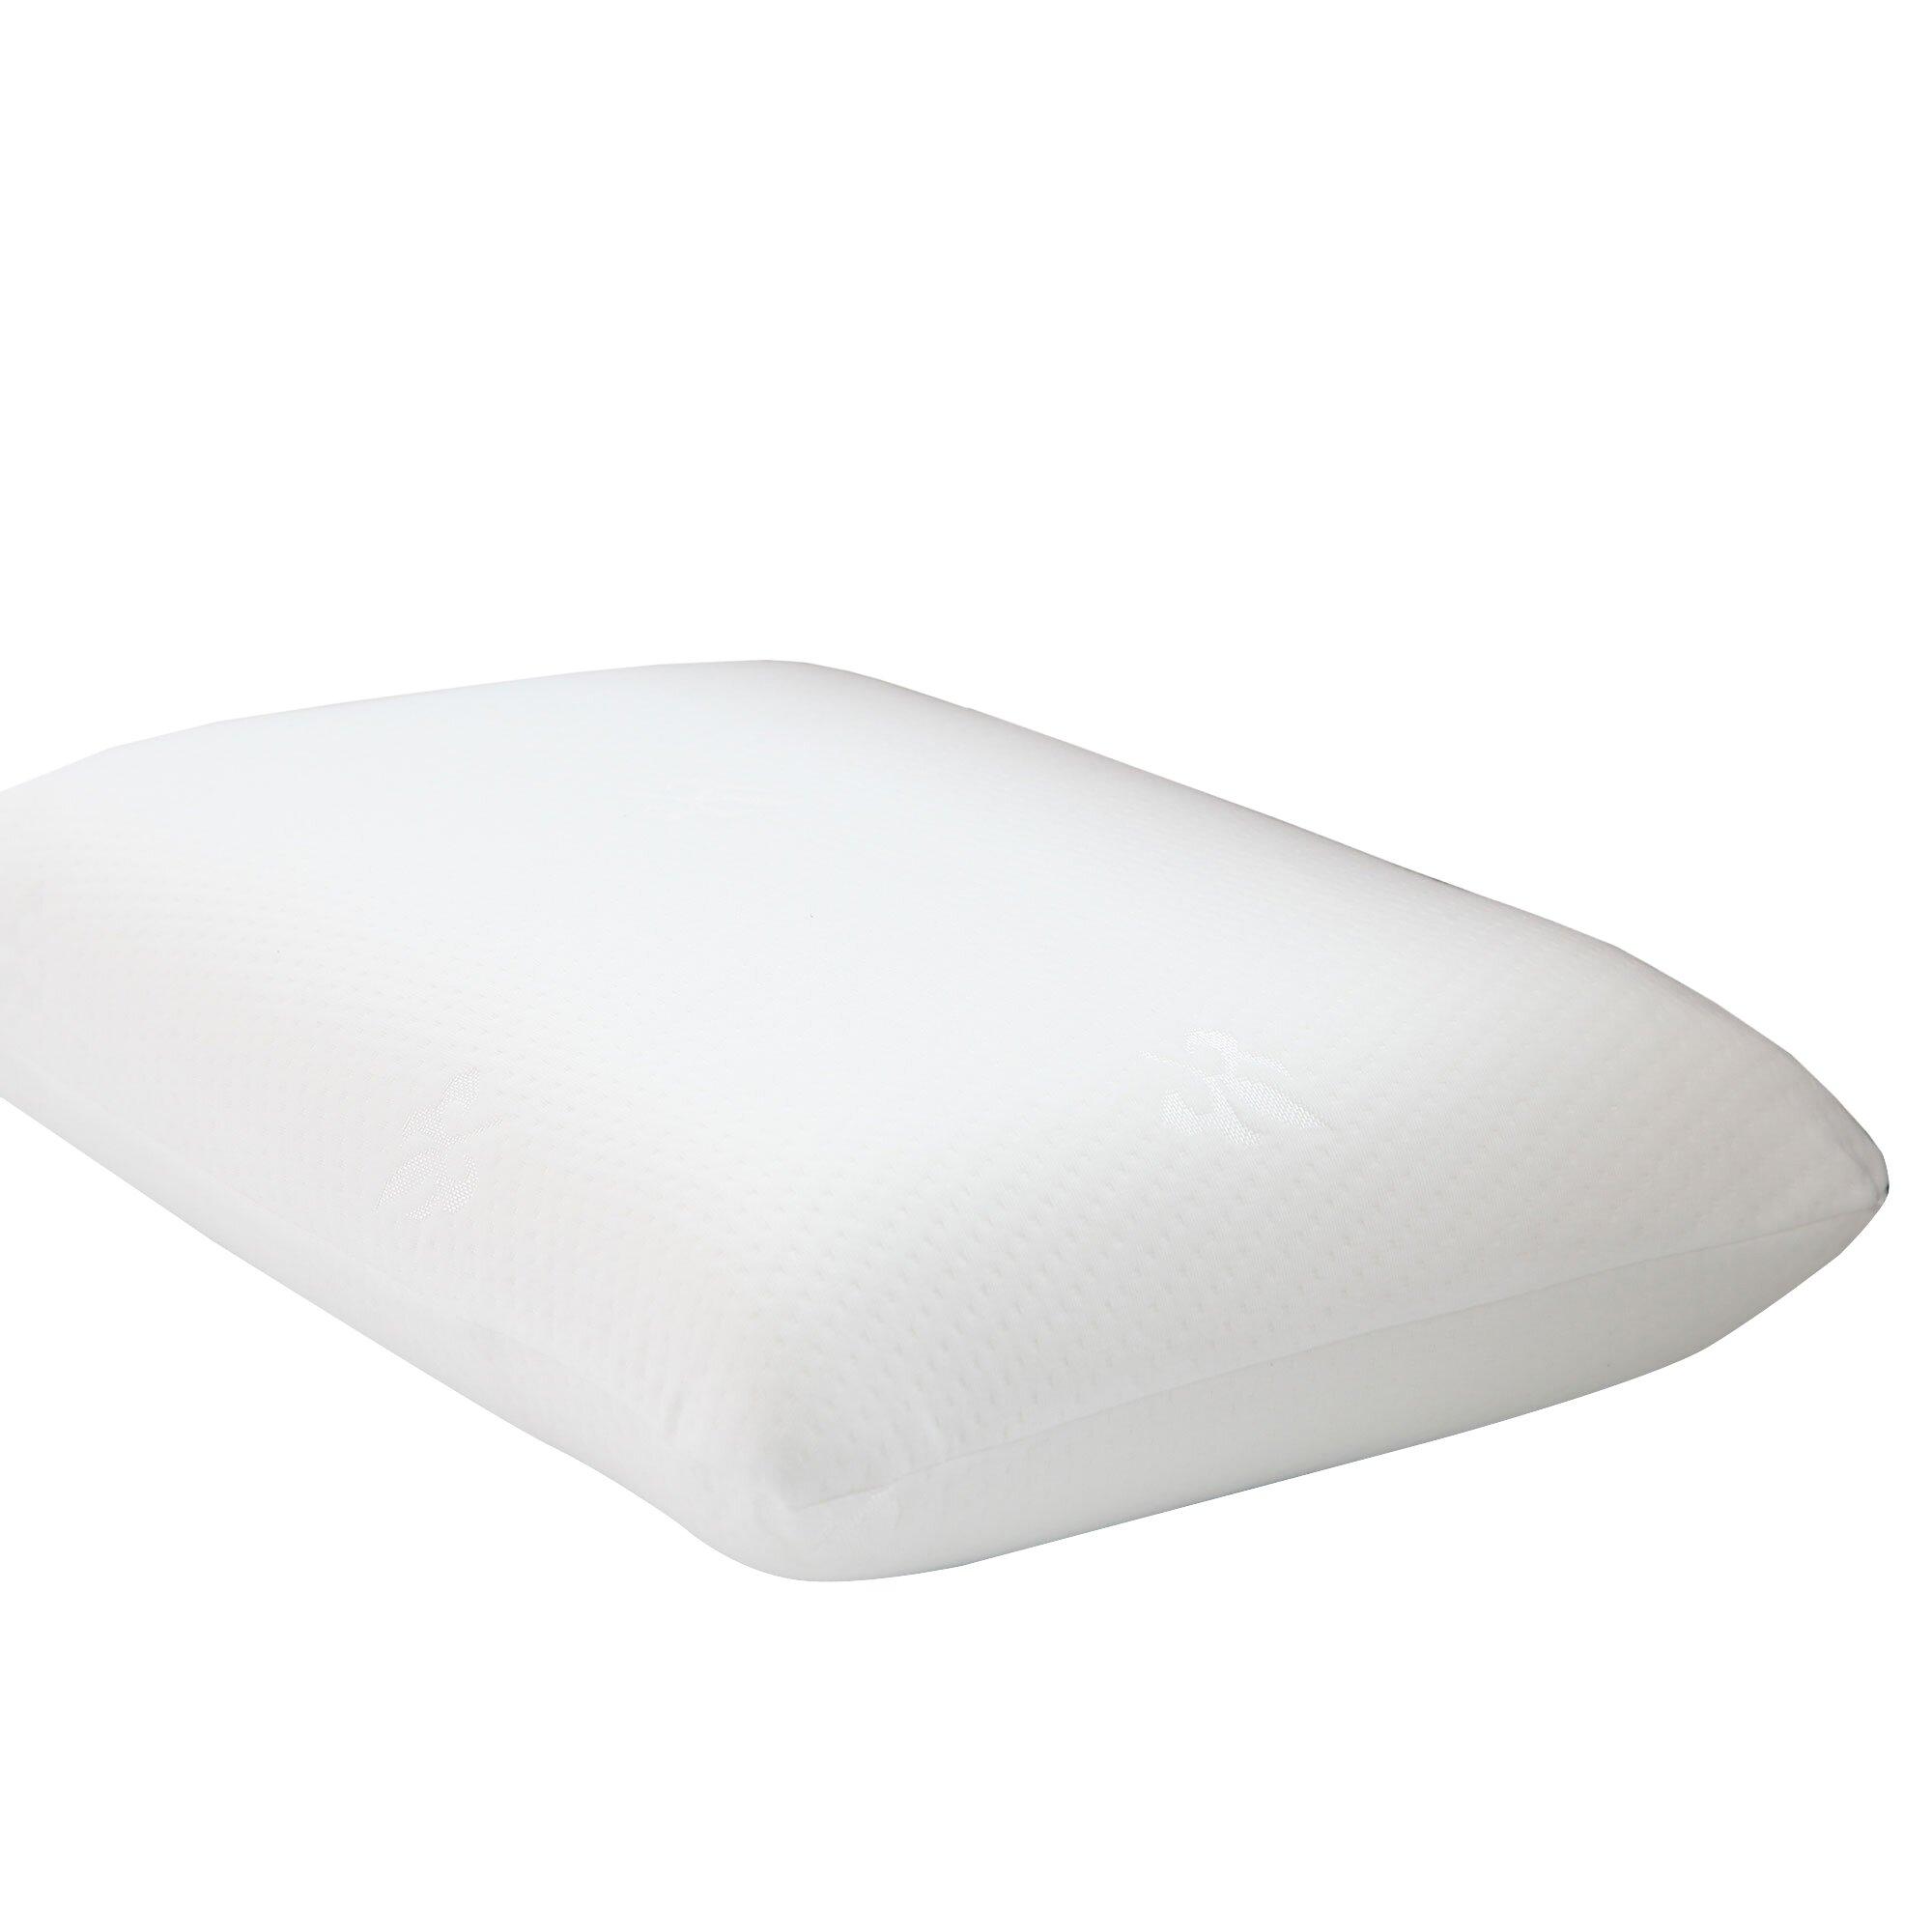 Remedy Gel Memory Foam Pillow With Cover Amp Reviews Wayfair